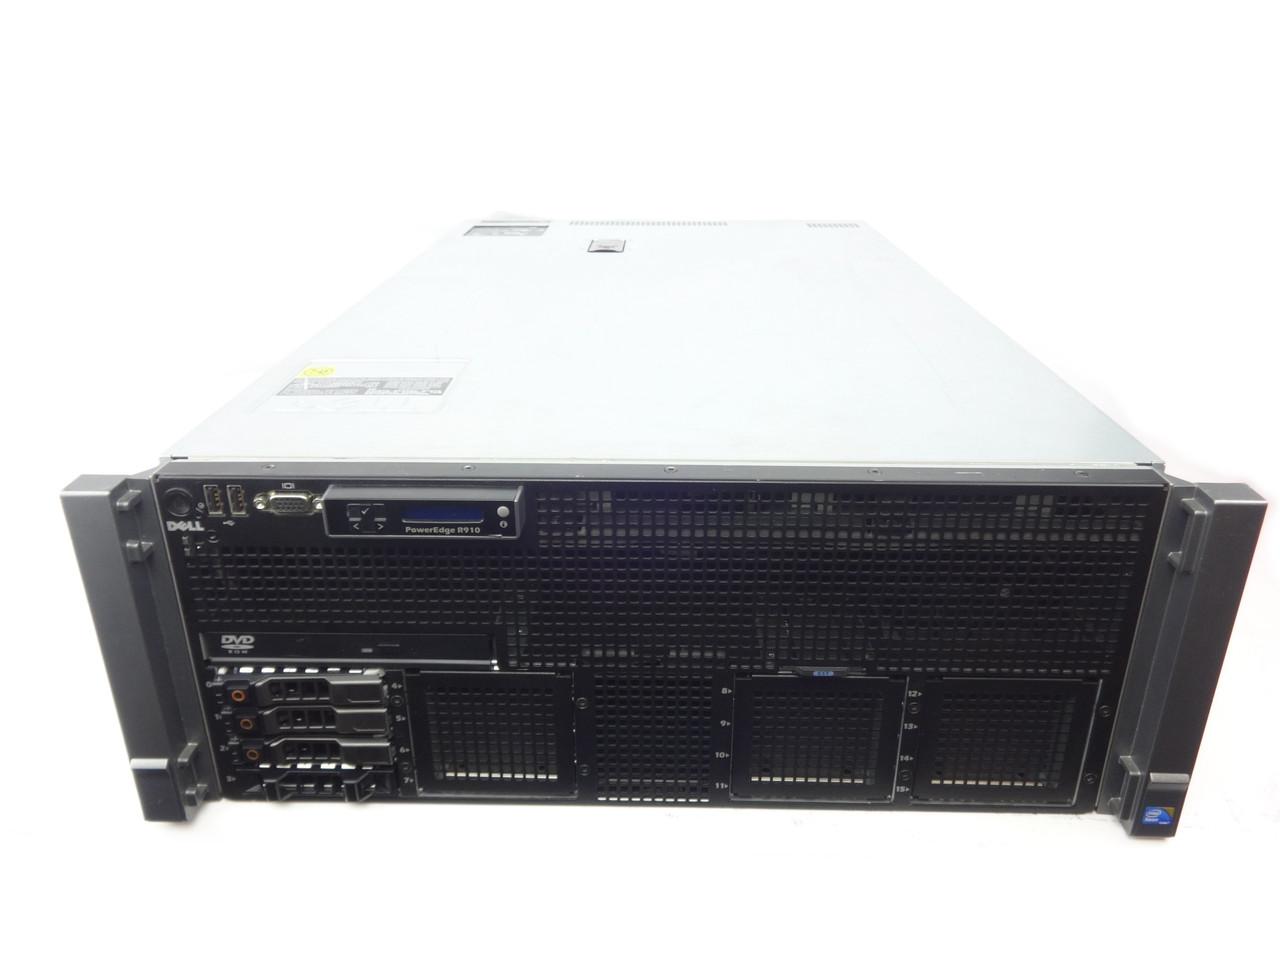 Dell Poweredge R910 4 Bay Server